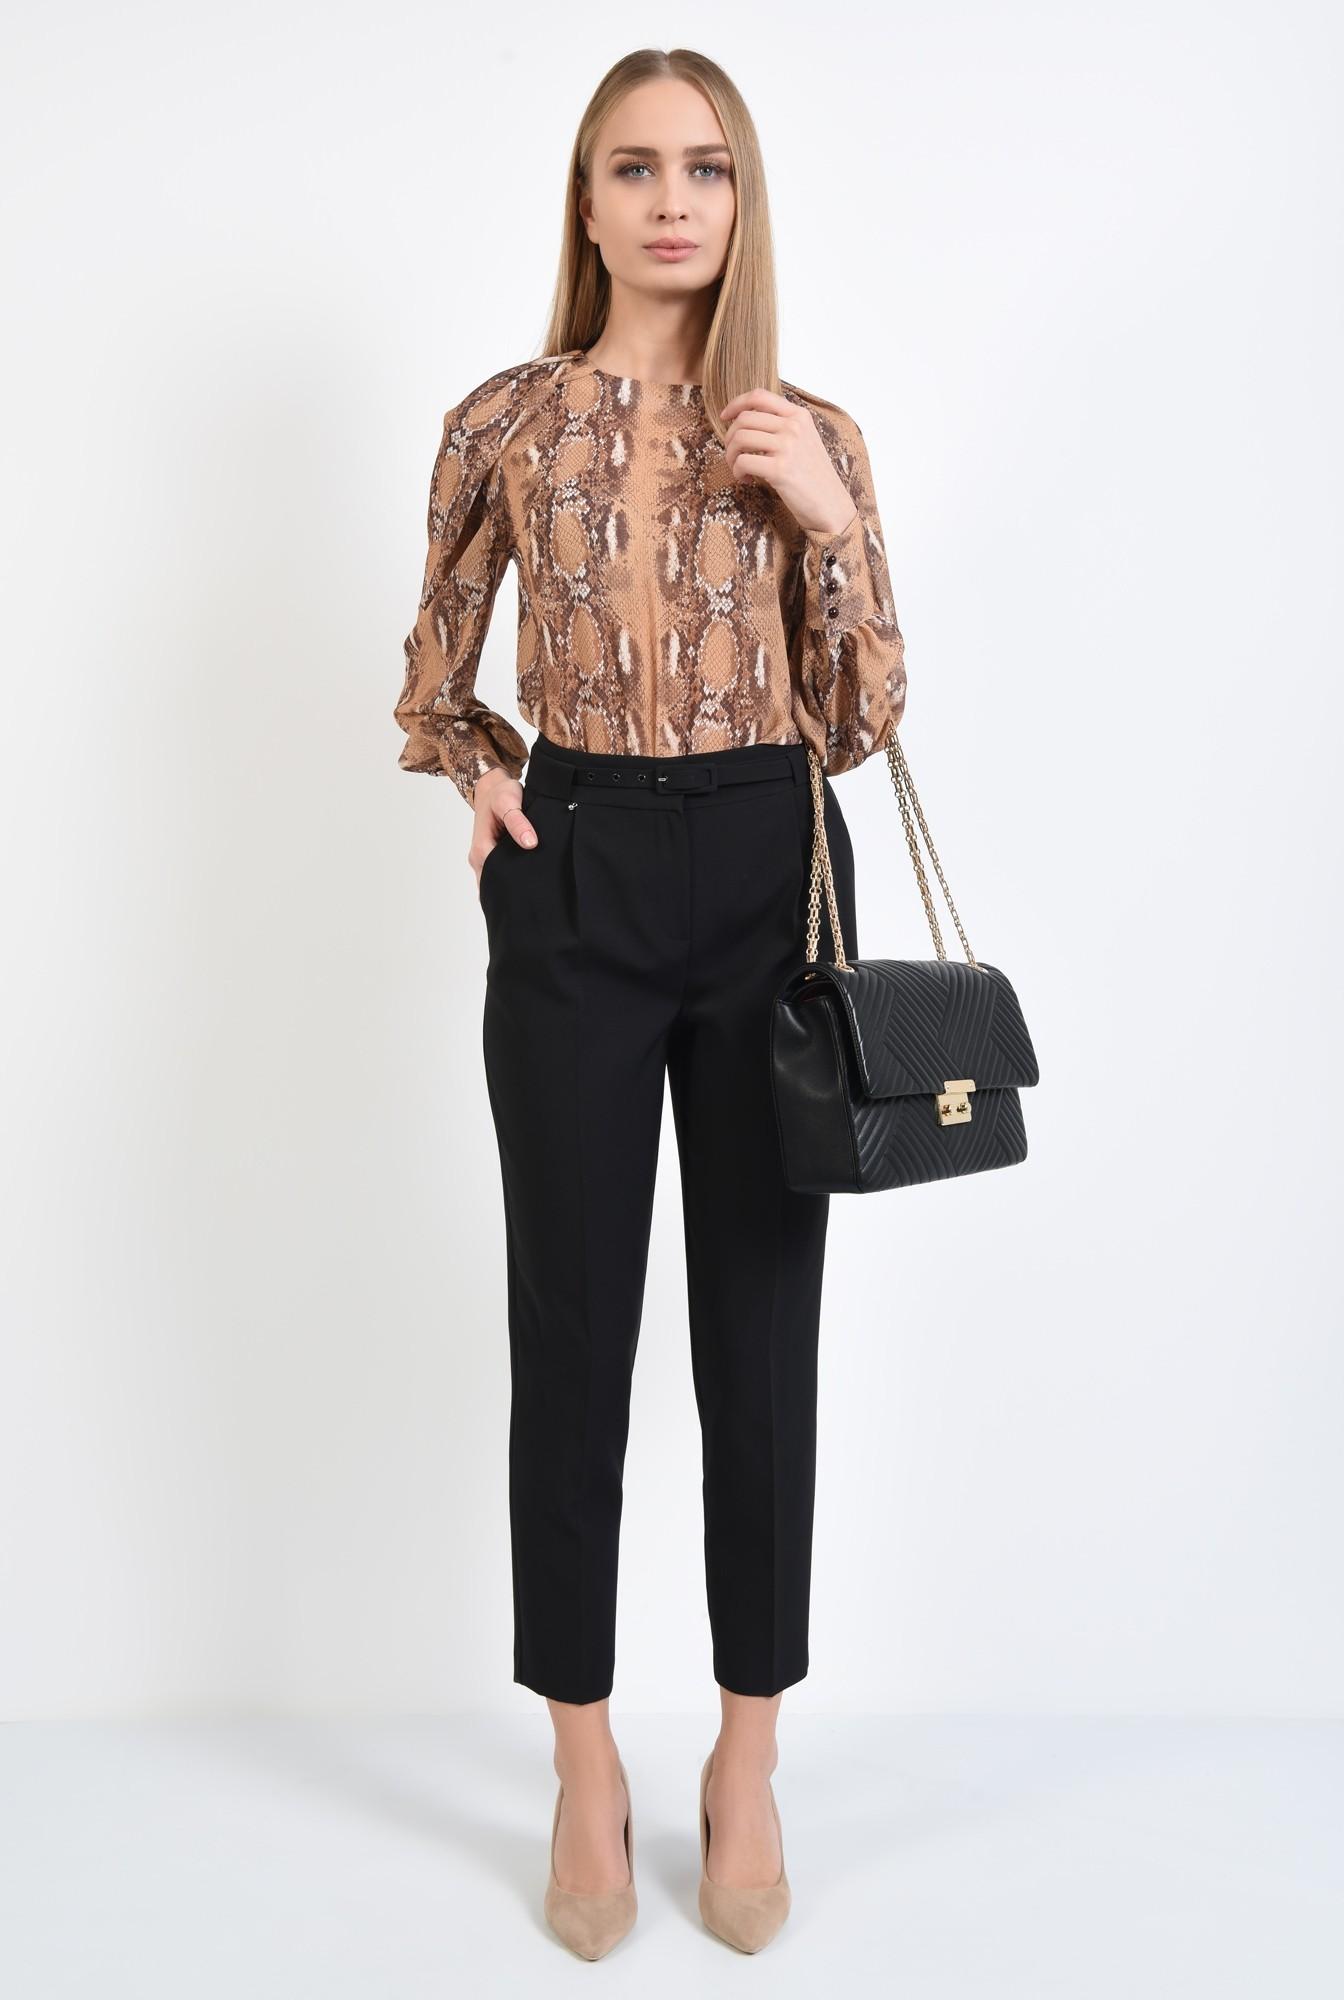 3 - pantaloni de zi, negri, office, de birou, centura ingusta